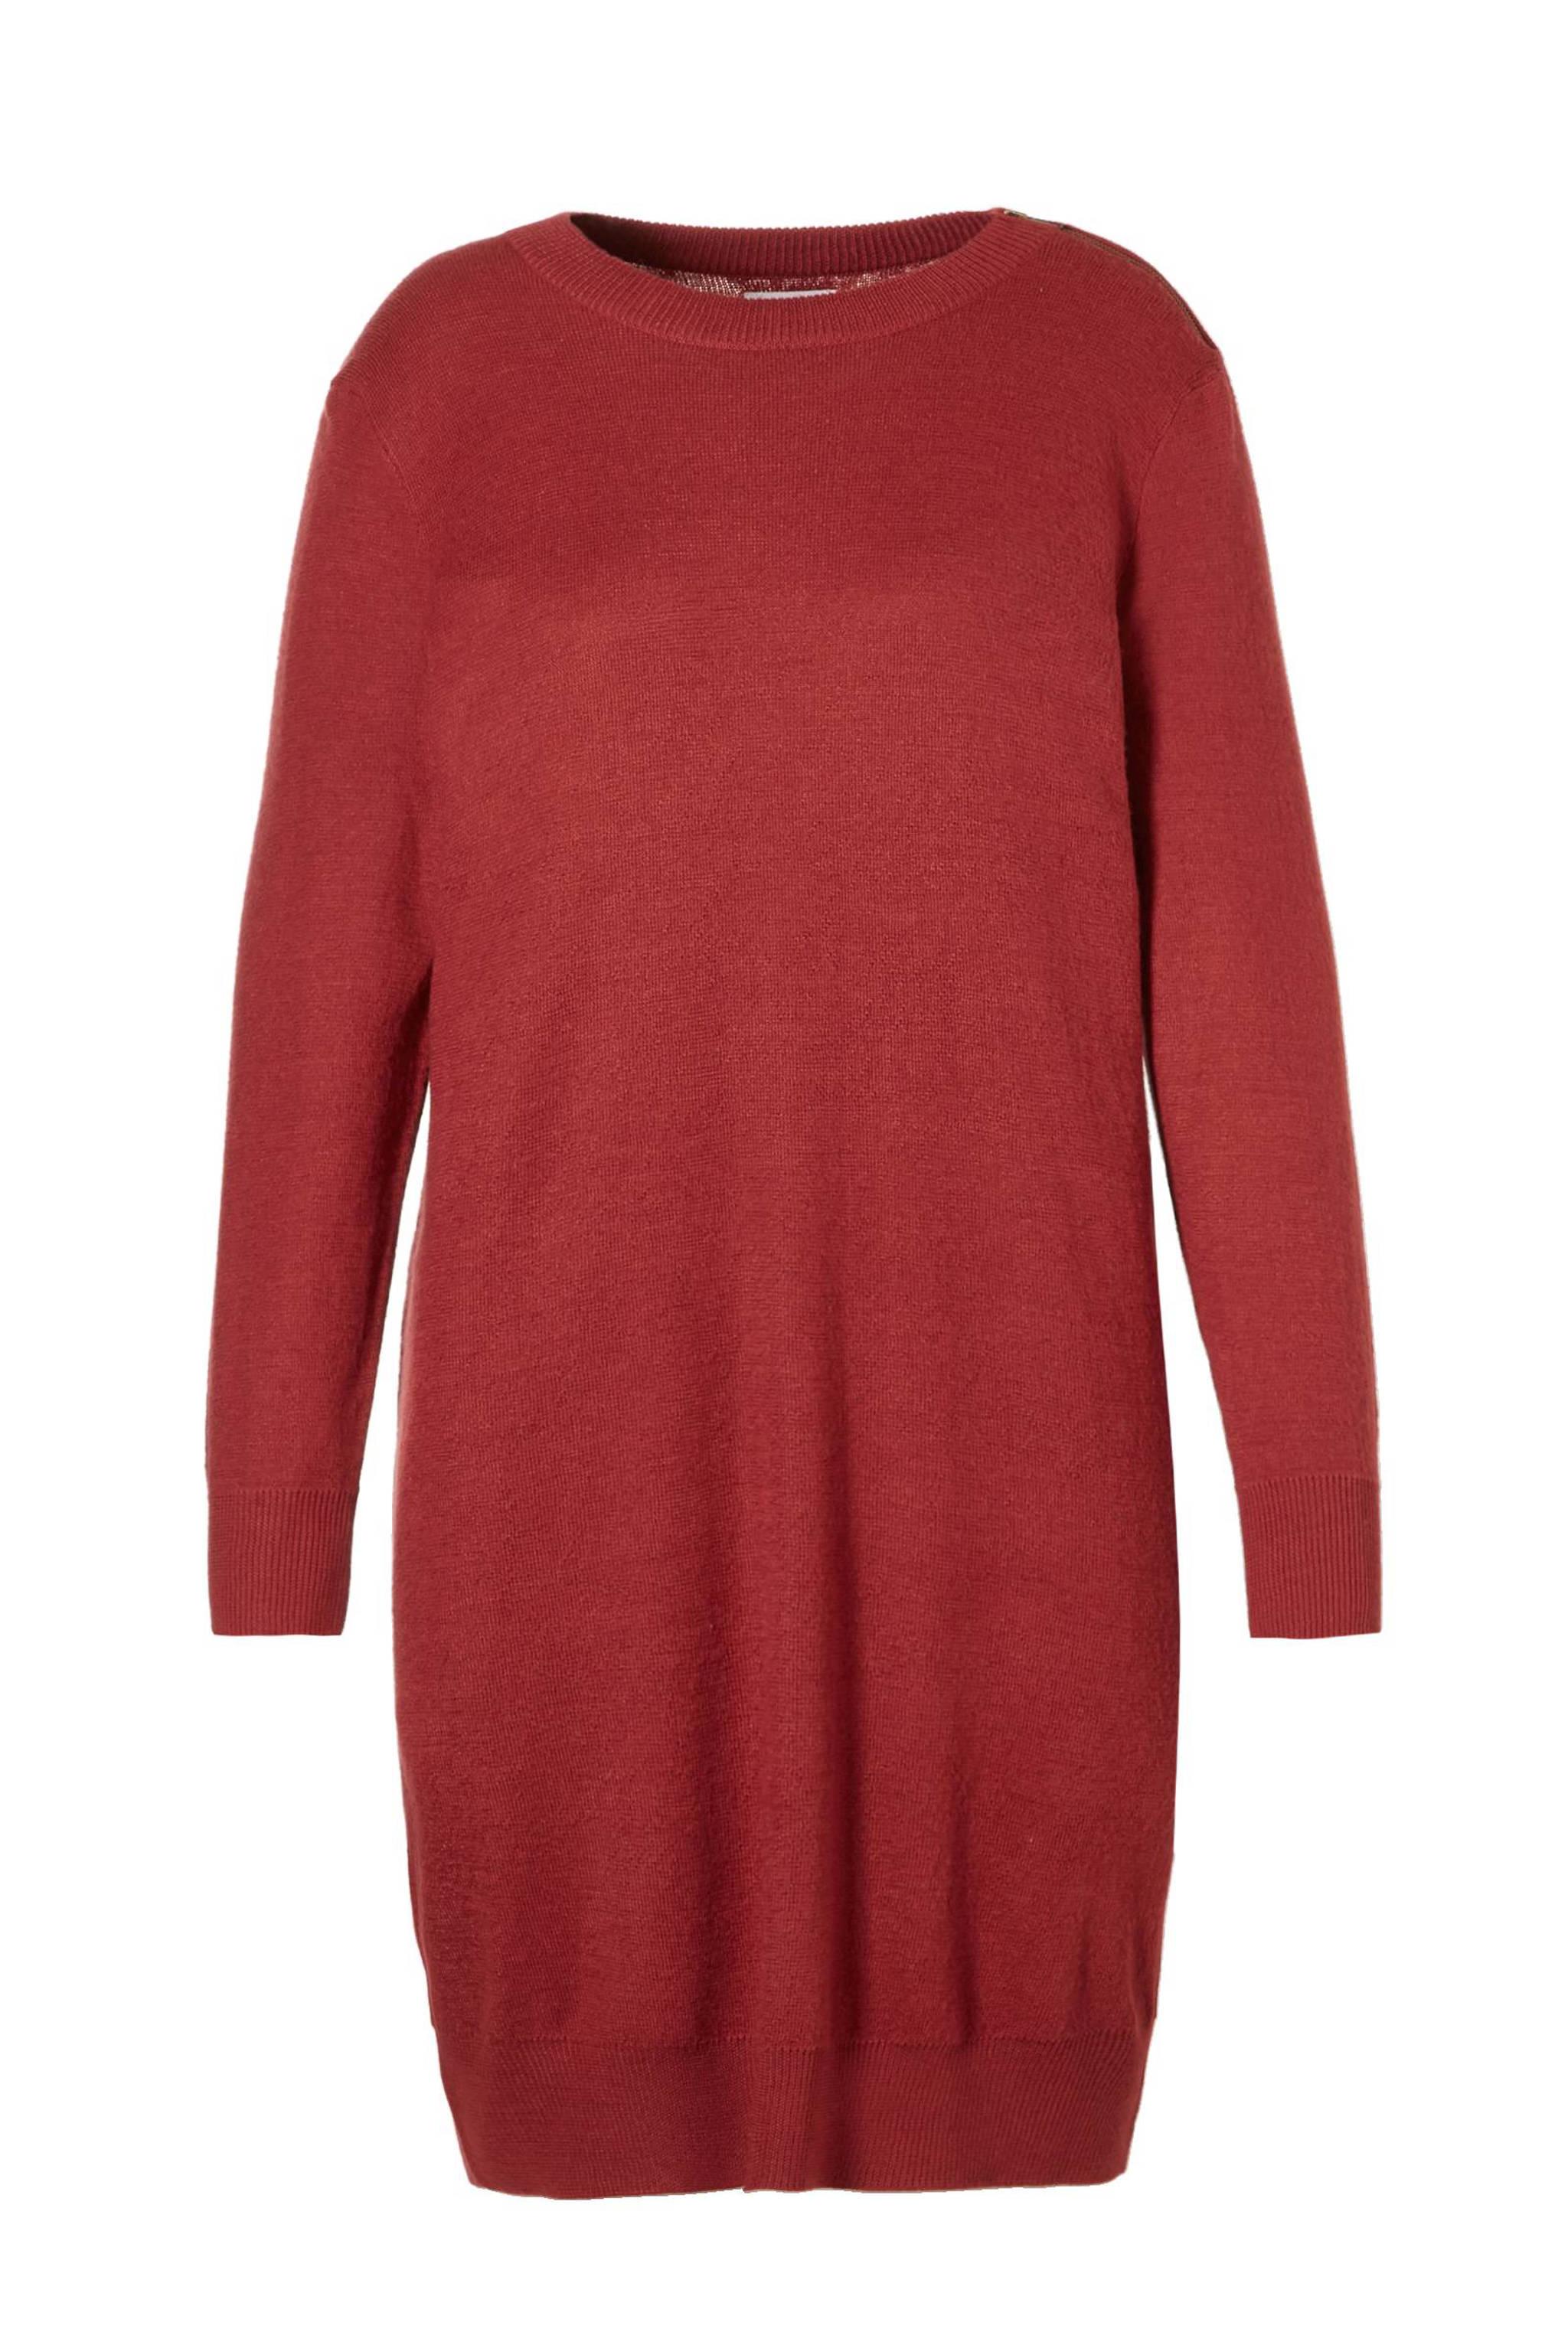 4127c5c7e2a077 Zizzi gebreide jurk met wol